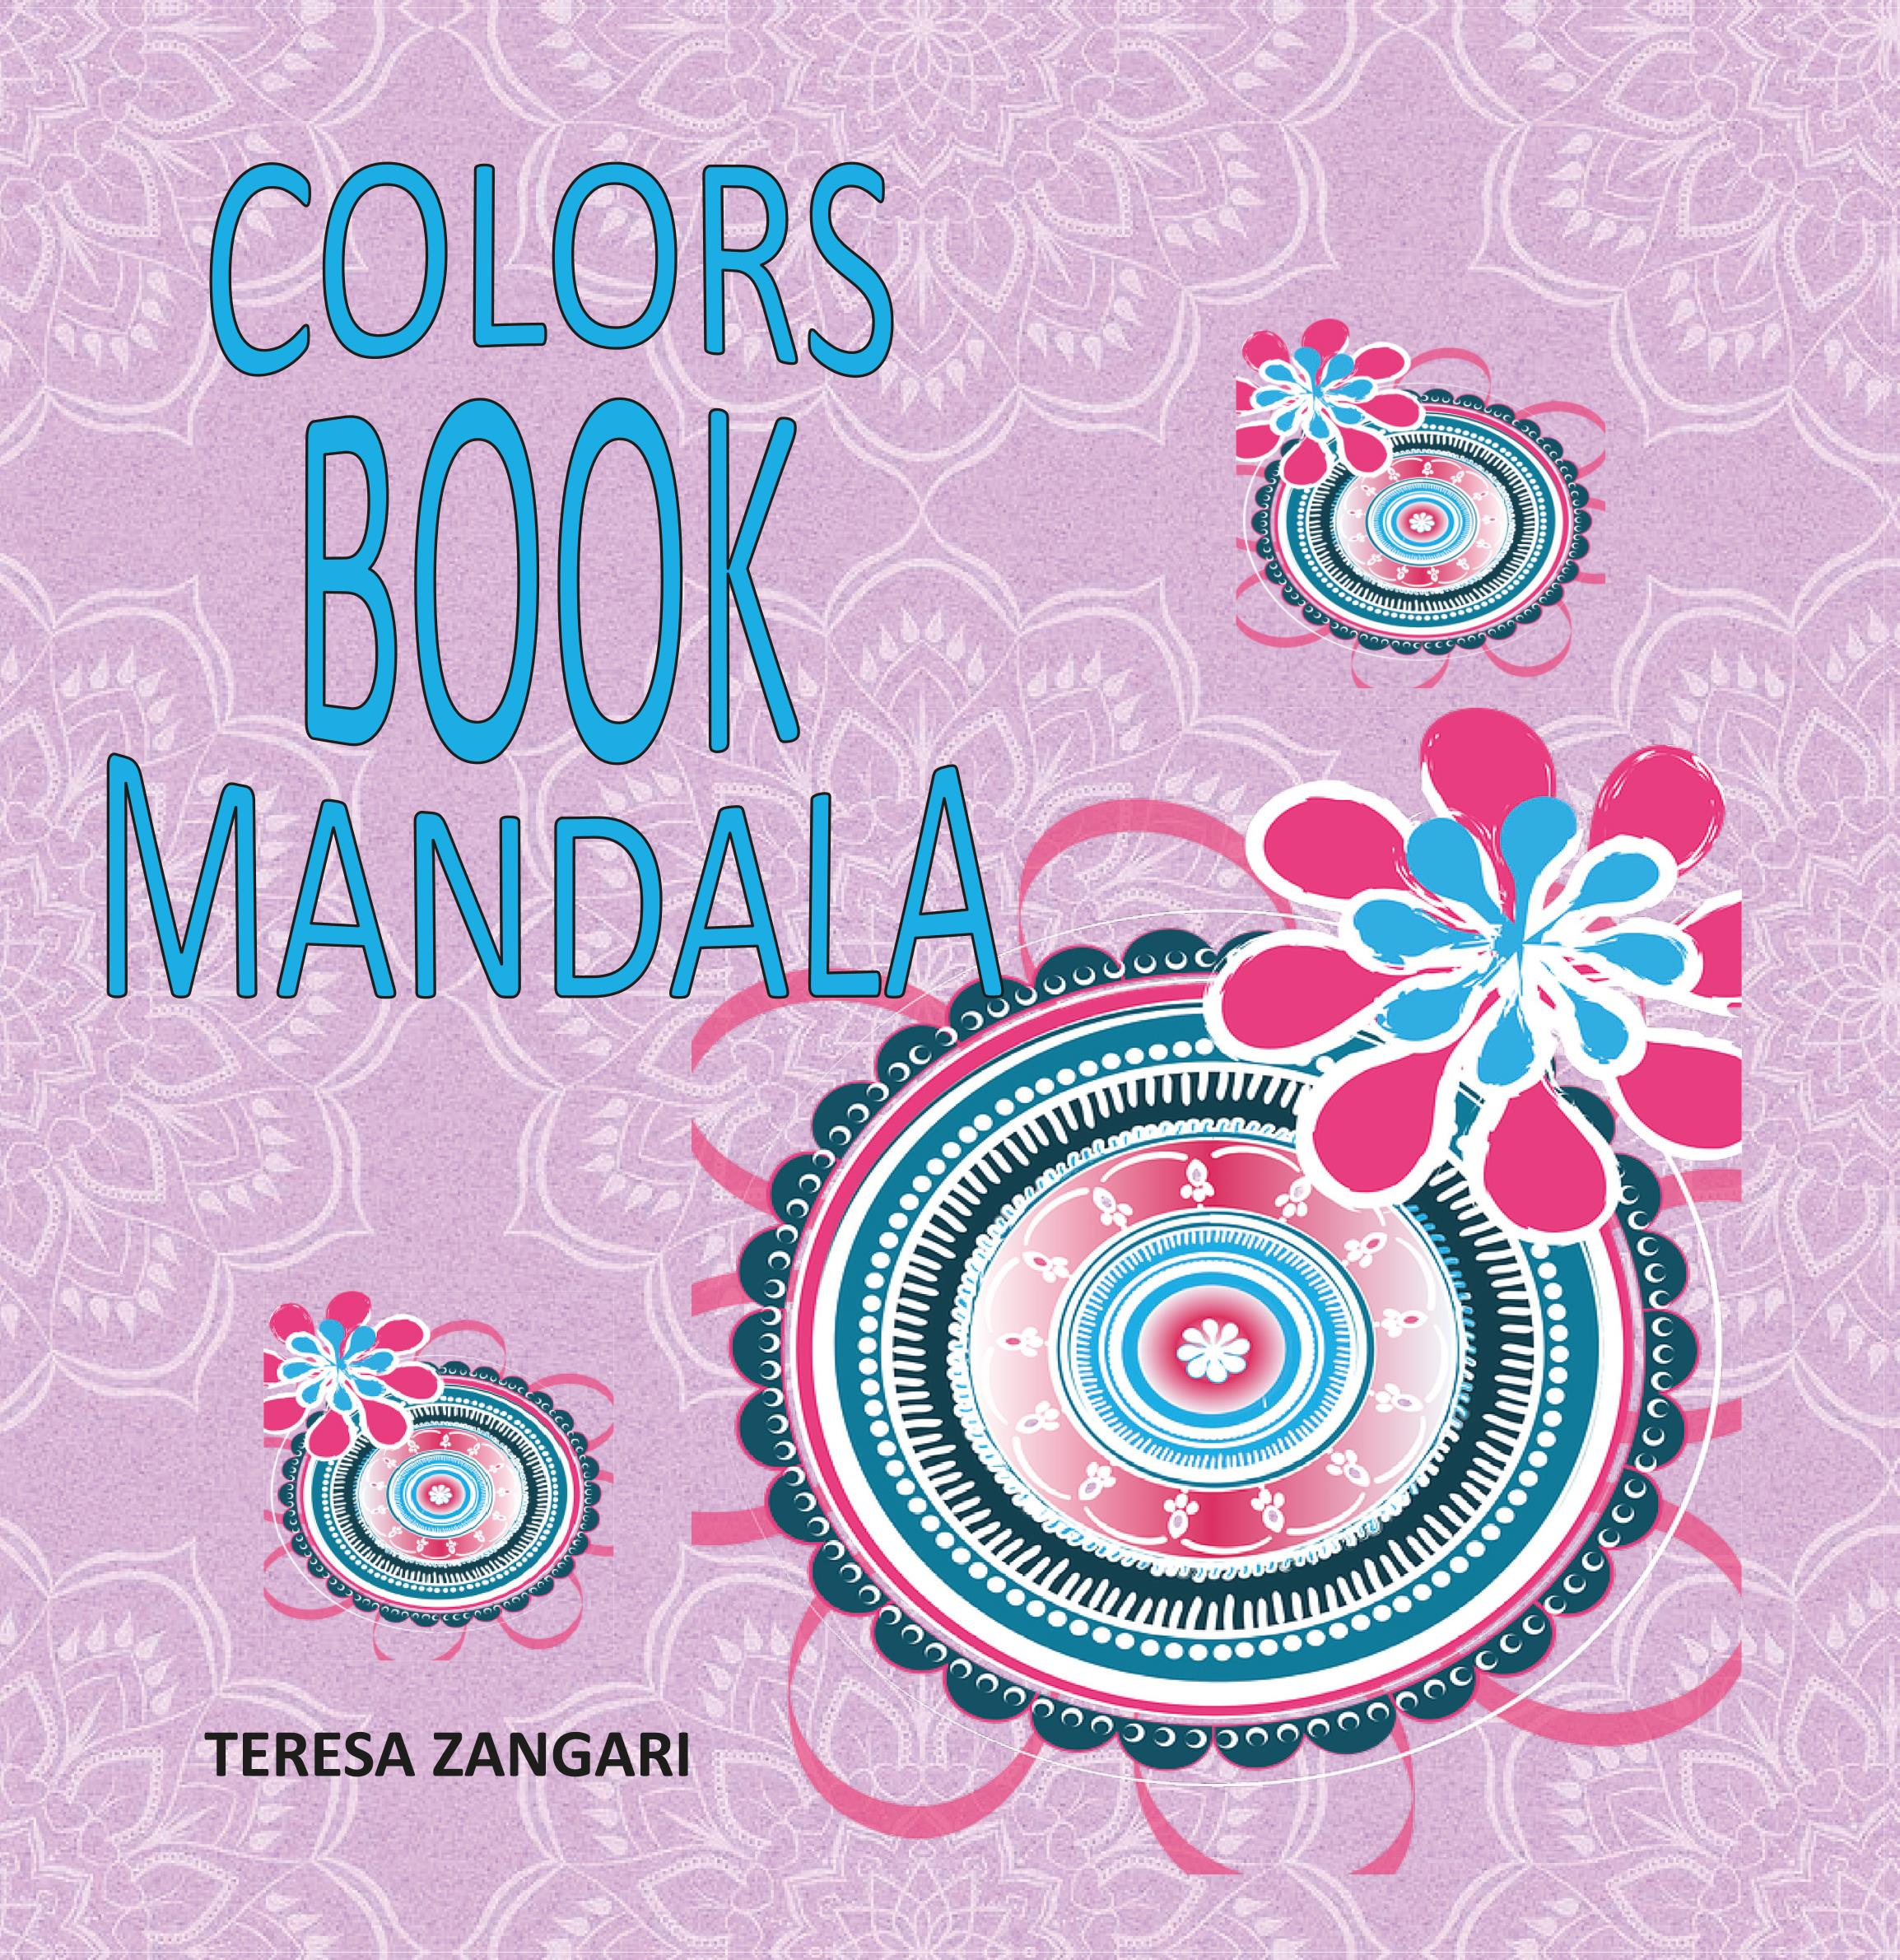 Color Book Mandala